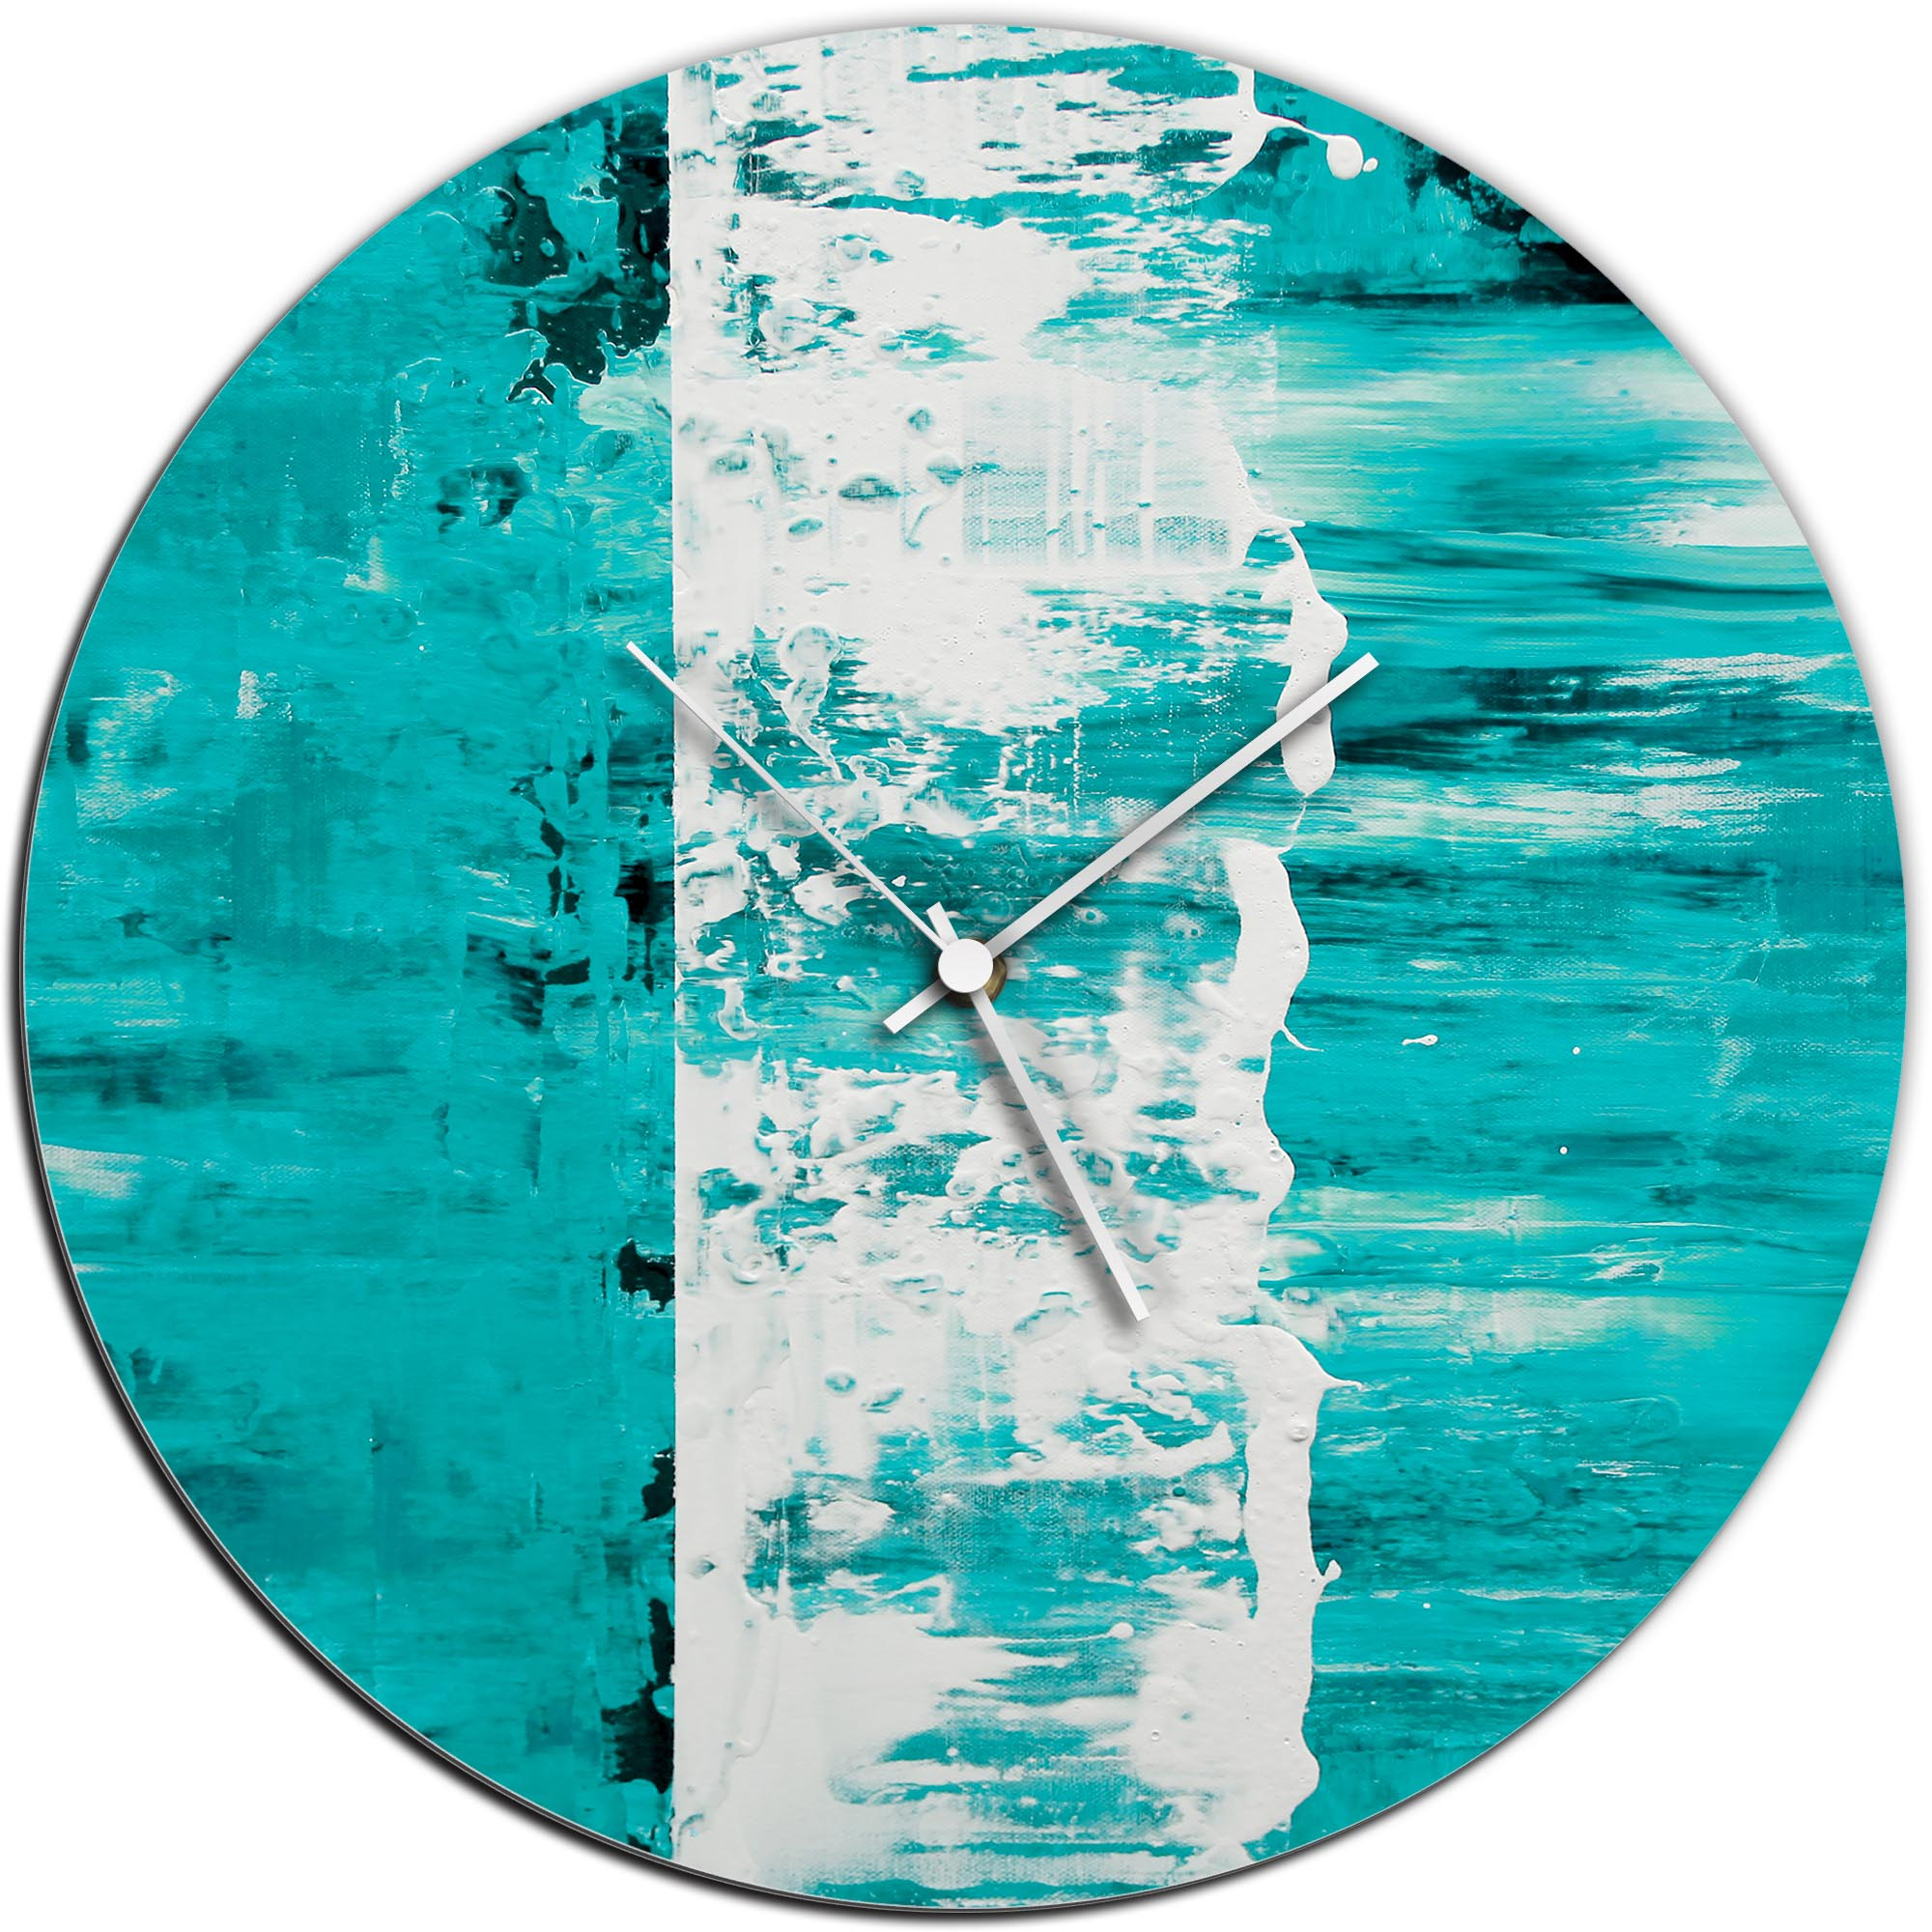 Mendo Vasilevski 'Teal Street Circle Clock' 16in x 16in Modern Wall Clock on Aluminum Composite